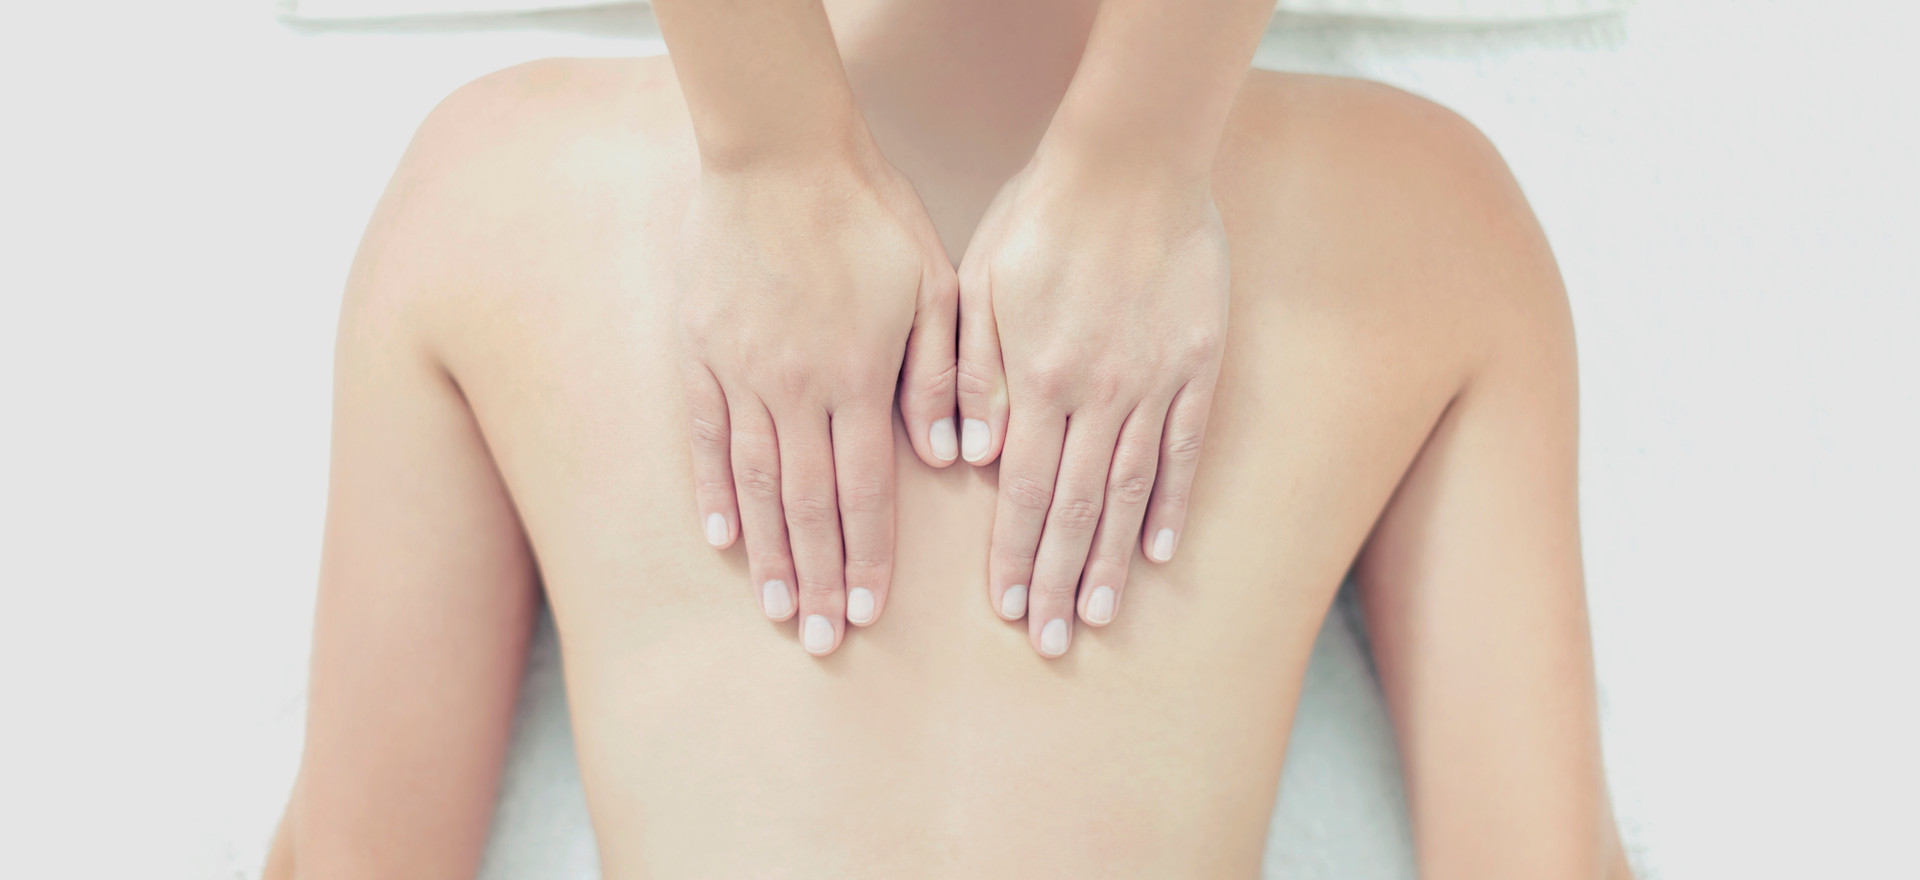 Massage thérapeutique tantra /1 pers